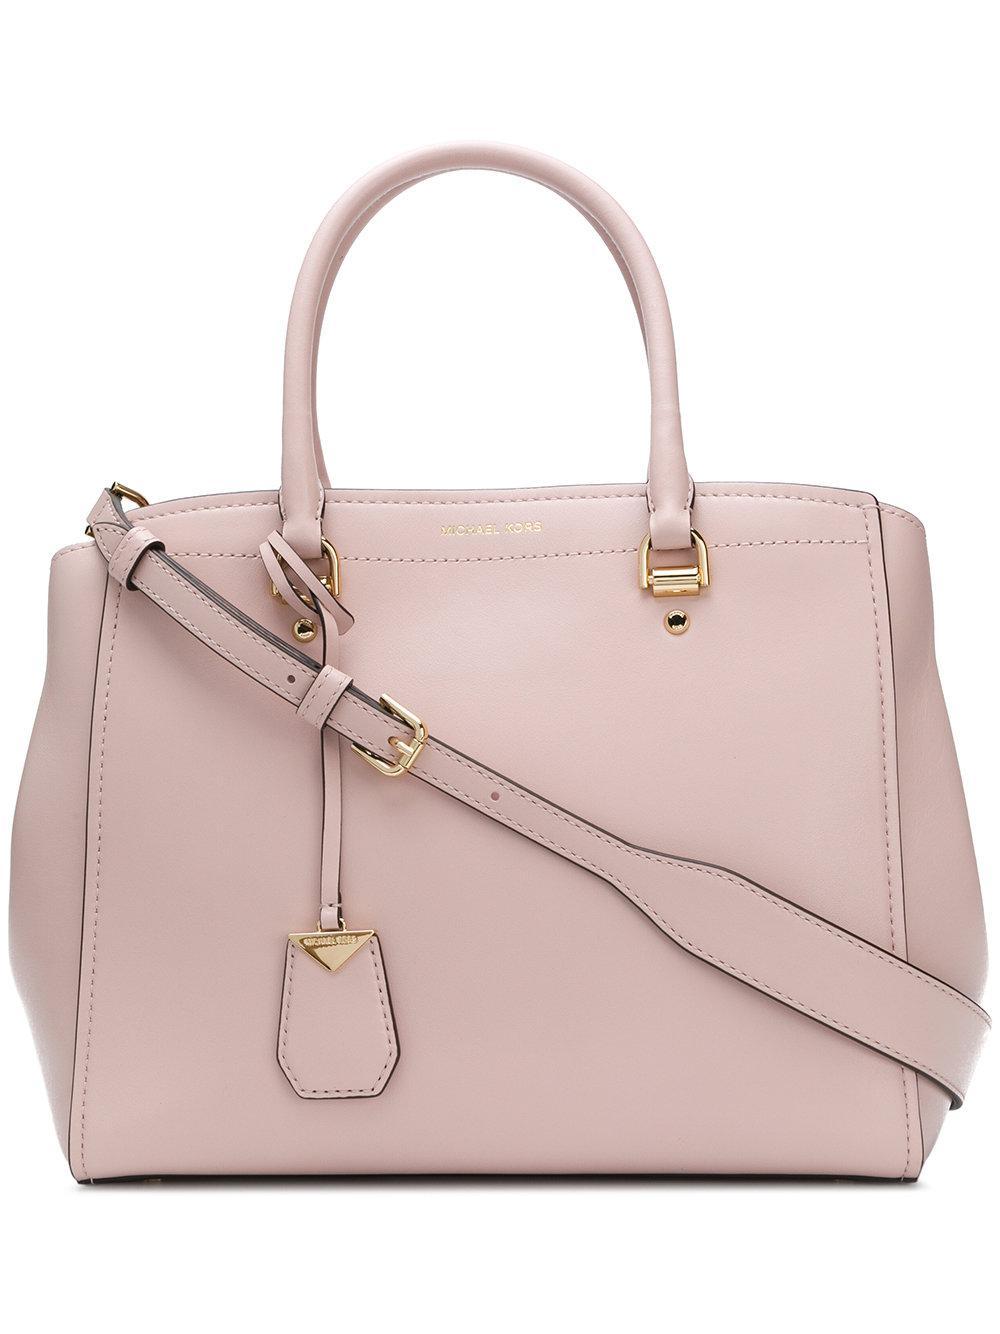 cc8b74c5e1f7 MICHAEL Michael Kors Benning Leather Shoulder Bag in Pink - Lyst